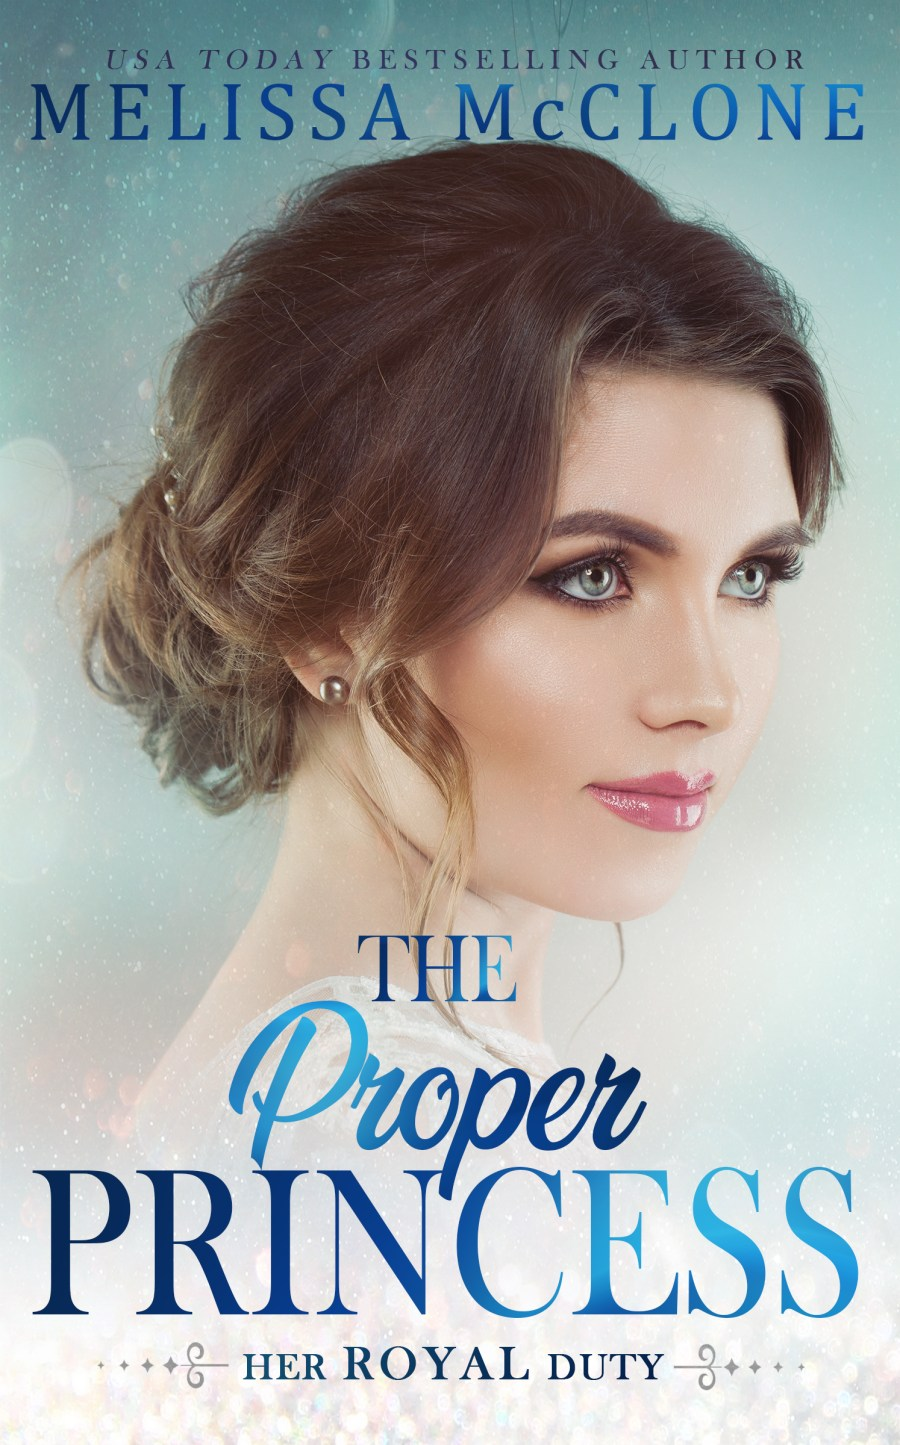 The Proper Princess (Her Royal Duty #3)